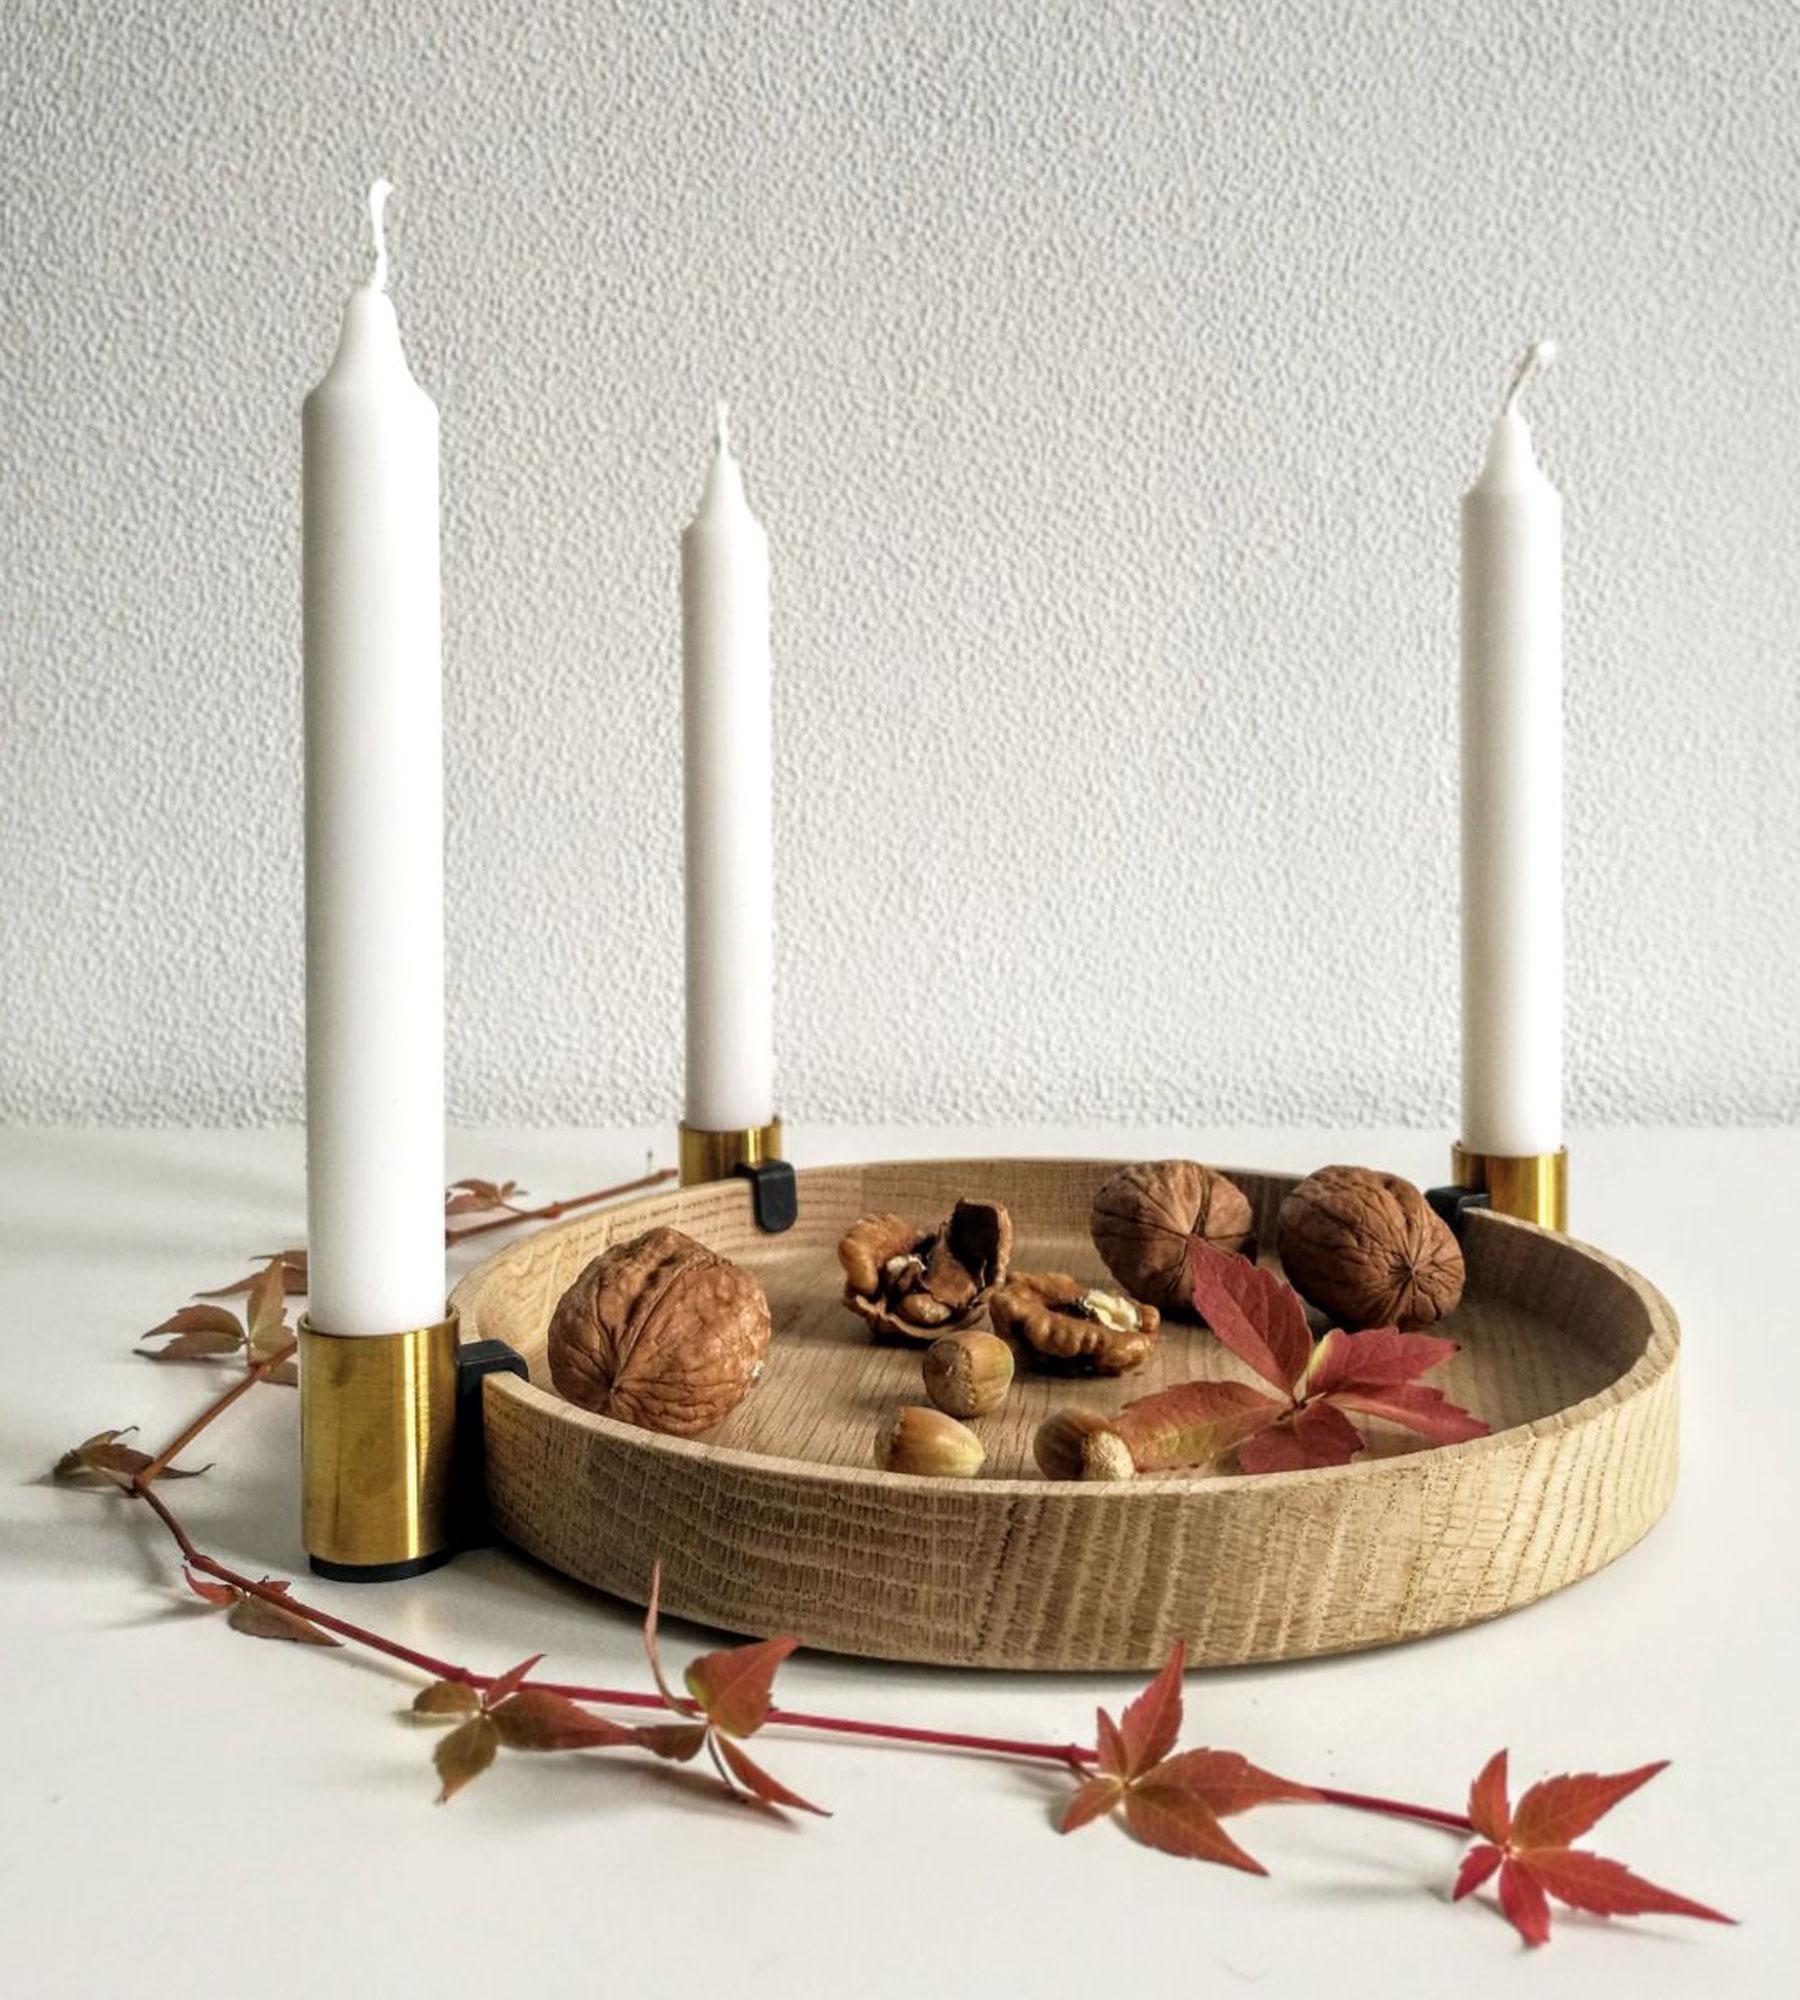 kerzenhalter luna von applicata i holzdesignpur. Black Bedroom Furniture Sets. Home Design Ideas